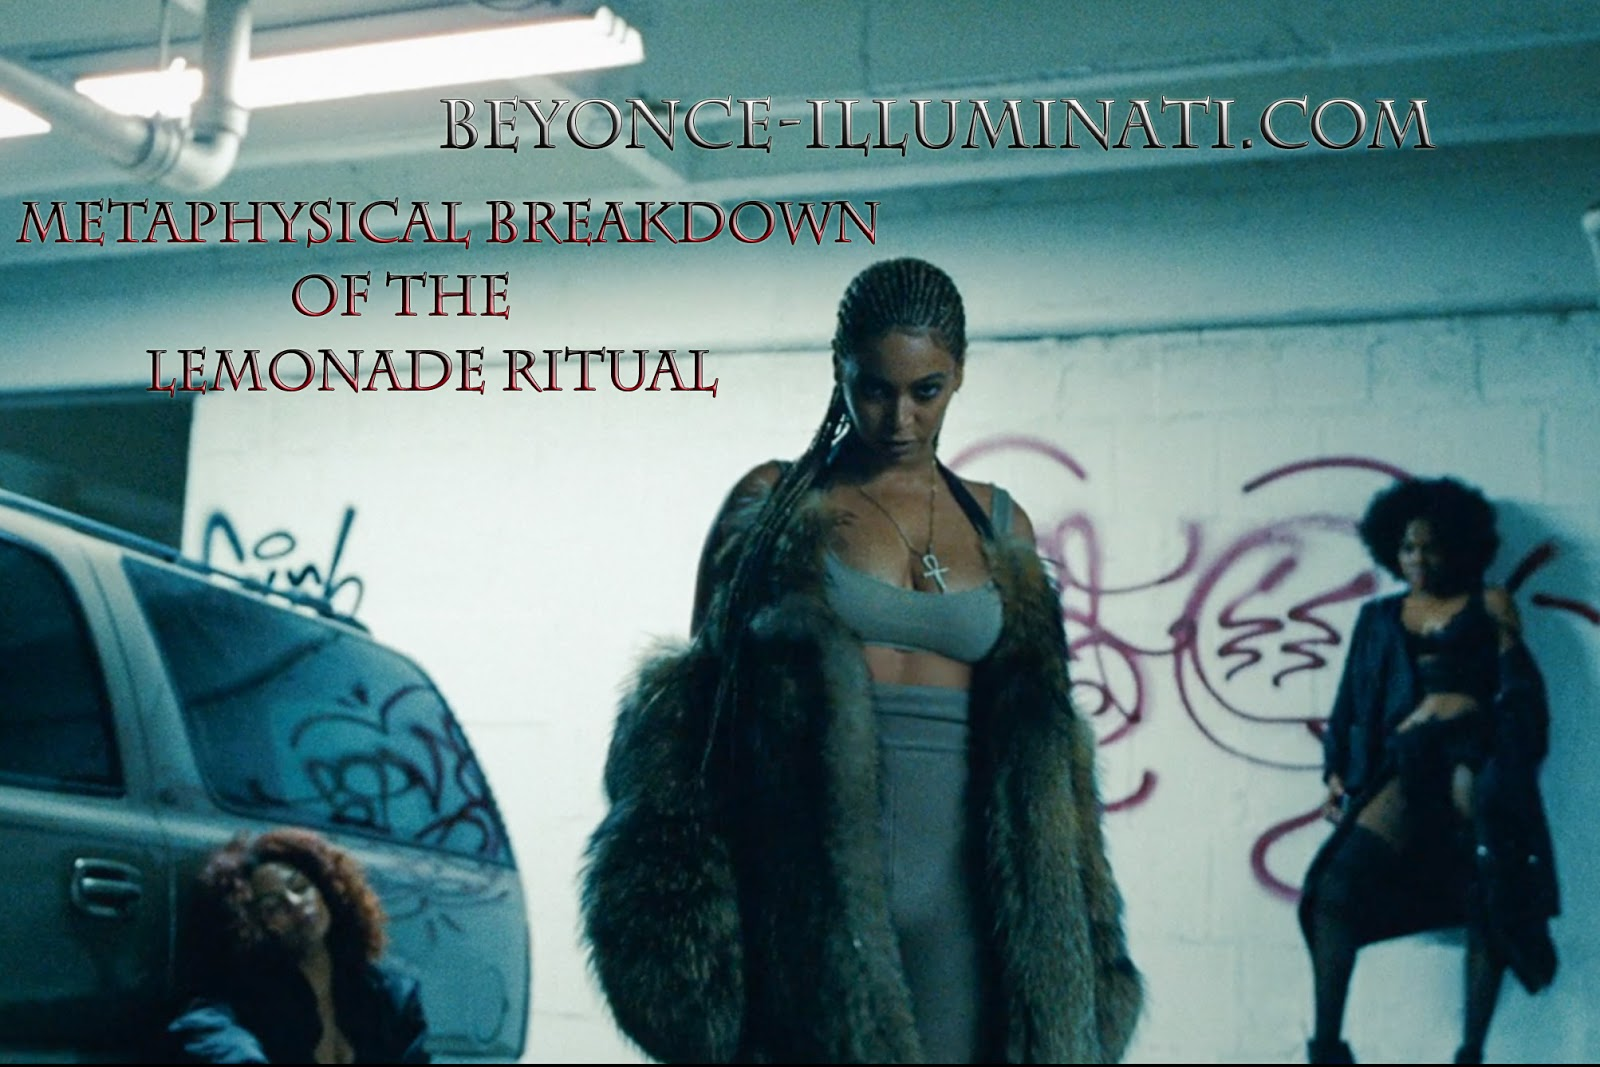 Beyonce illuminati is beyonce in the illuminati the truth beyonce lemonade ritual esoteric meaning buycottarizona Gallery